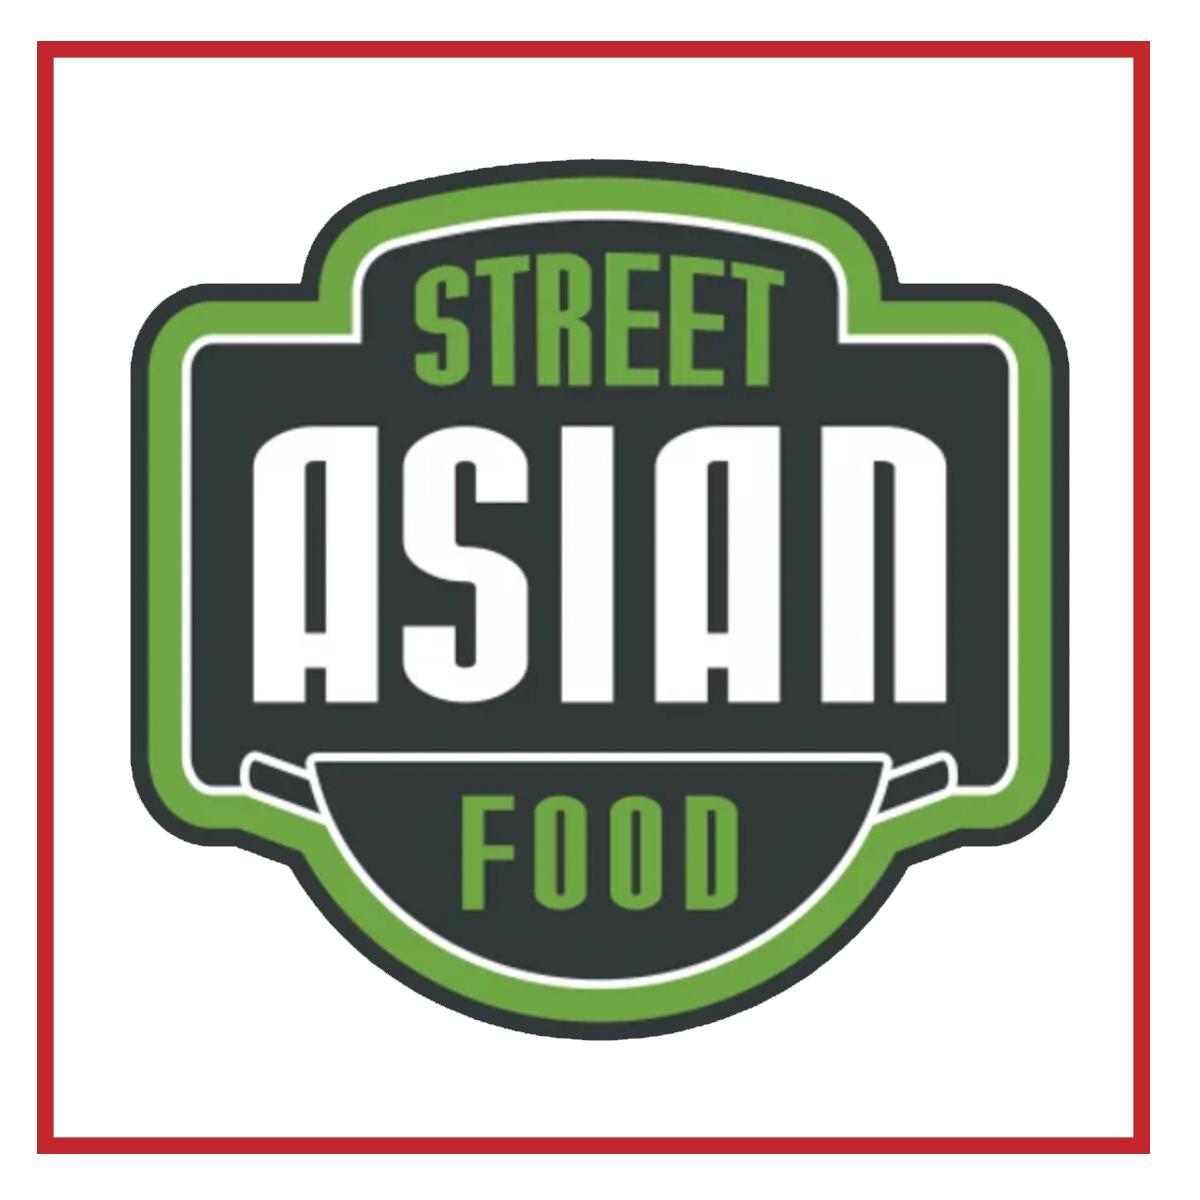 Street Asian Food